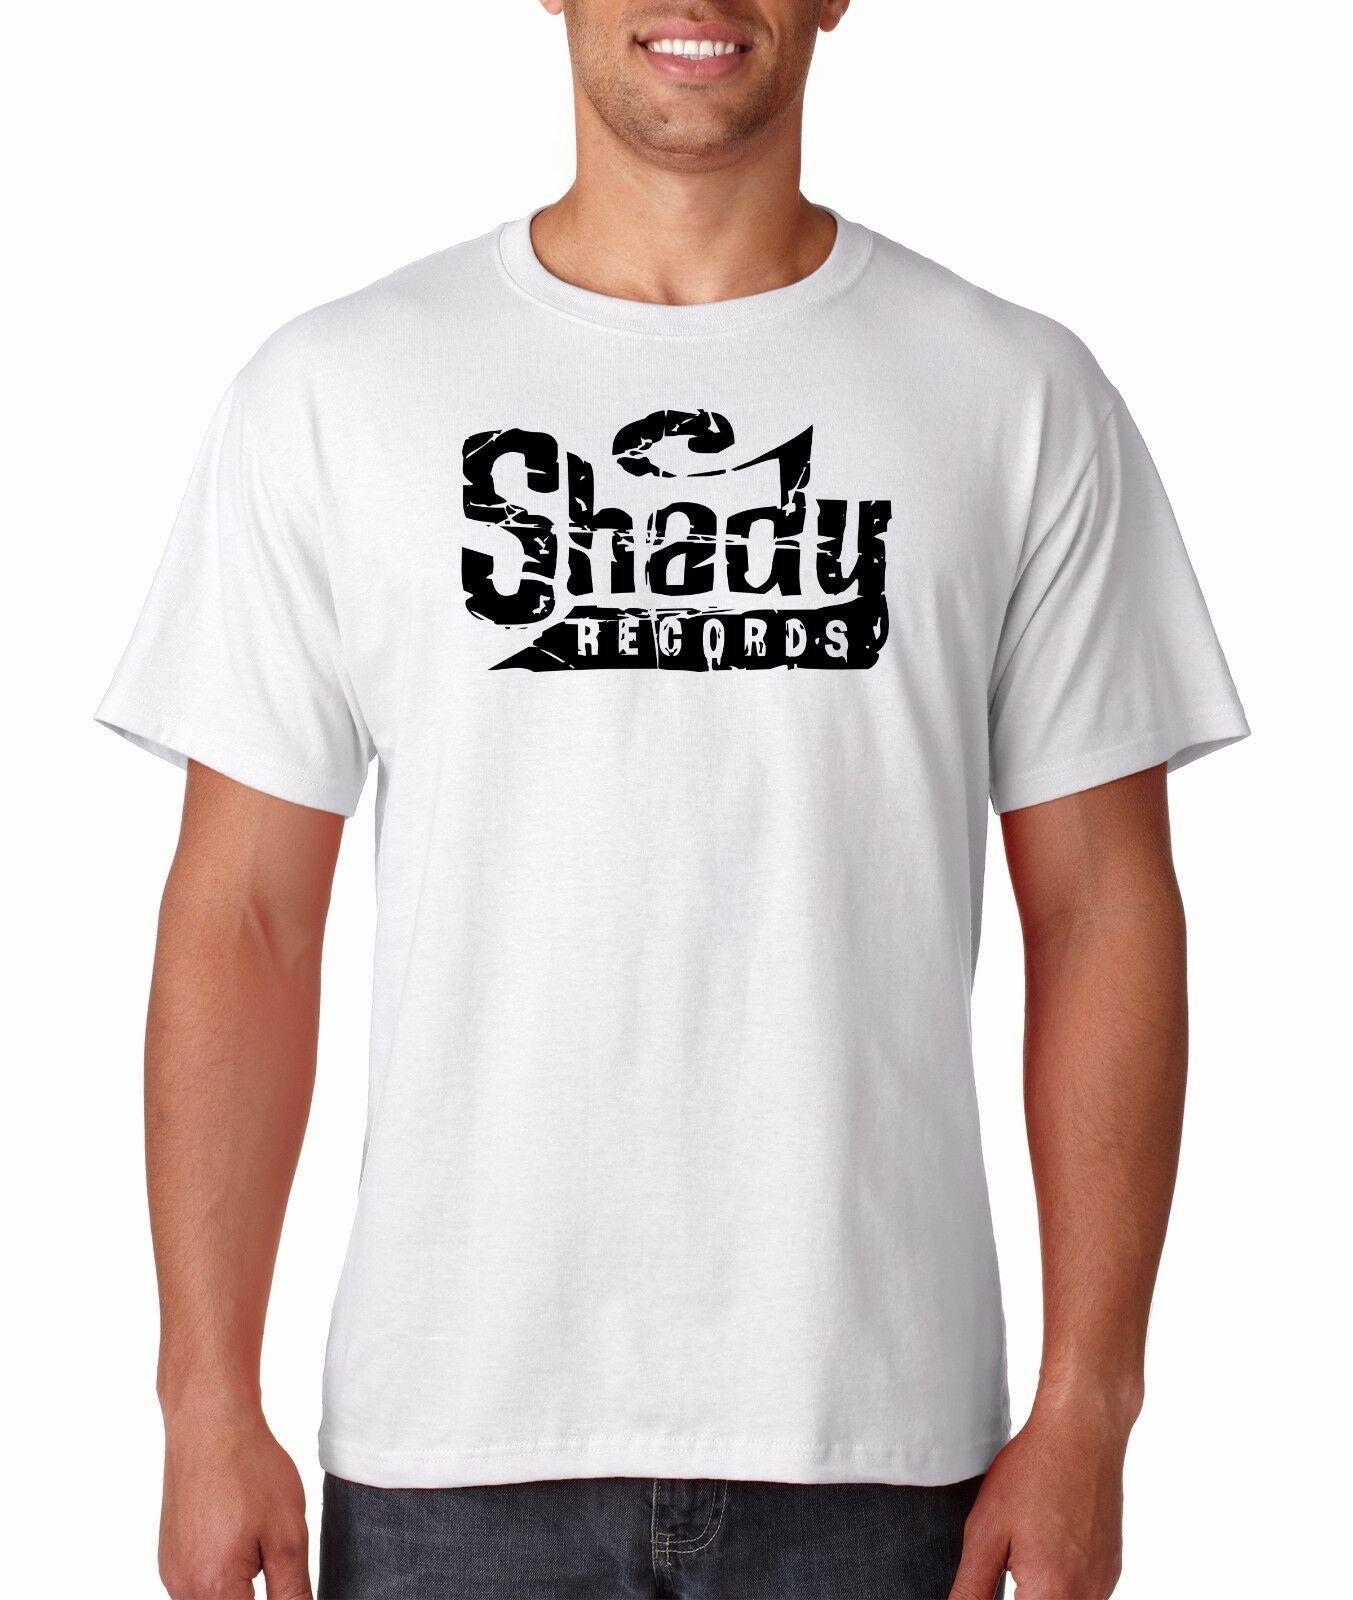 Shady Records Logo T Shirt Hip Hop Rap Slim Shady Eminem Detroit Revival Emcees Top Quality camisetas Homens O Neck top tee